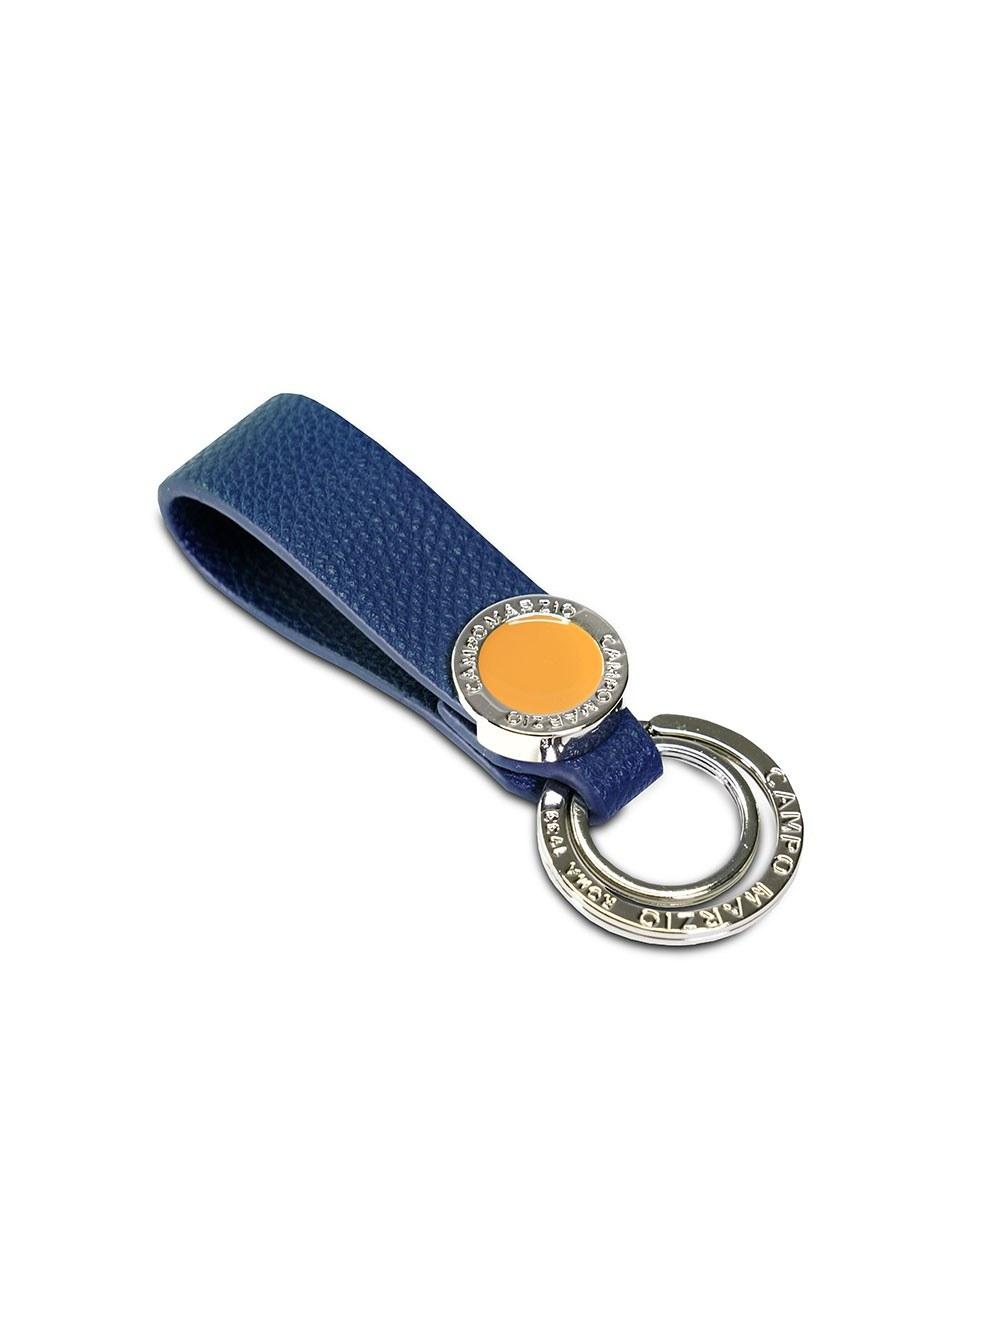 New Double Key Holder - Petrol Blue